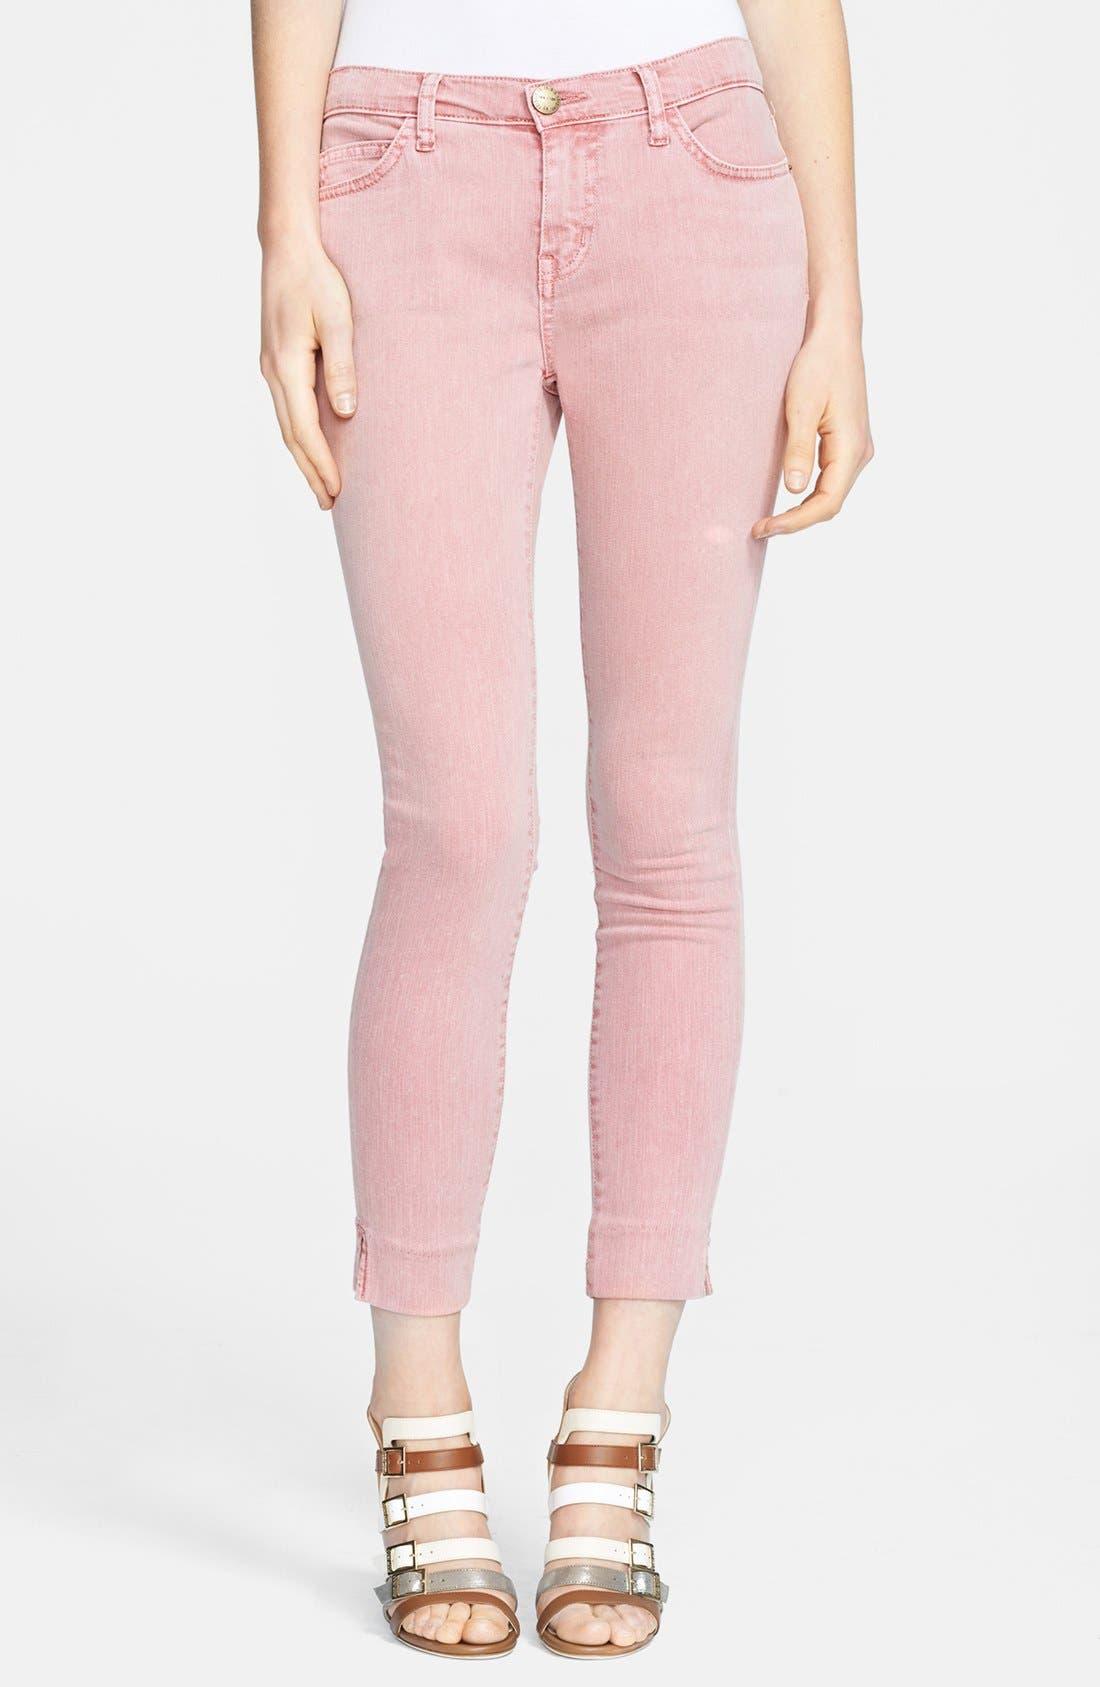 Main Image - Current/Elliott 'The Side Slit Stiletto' Jeans